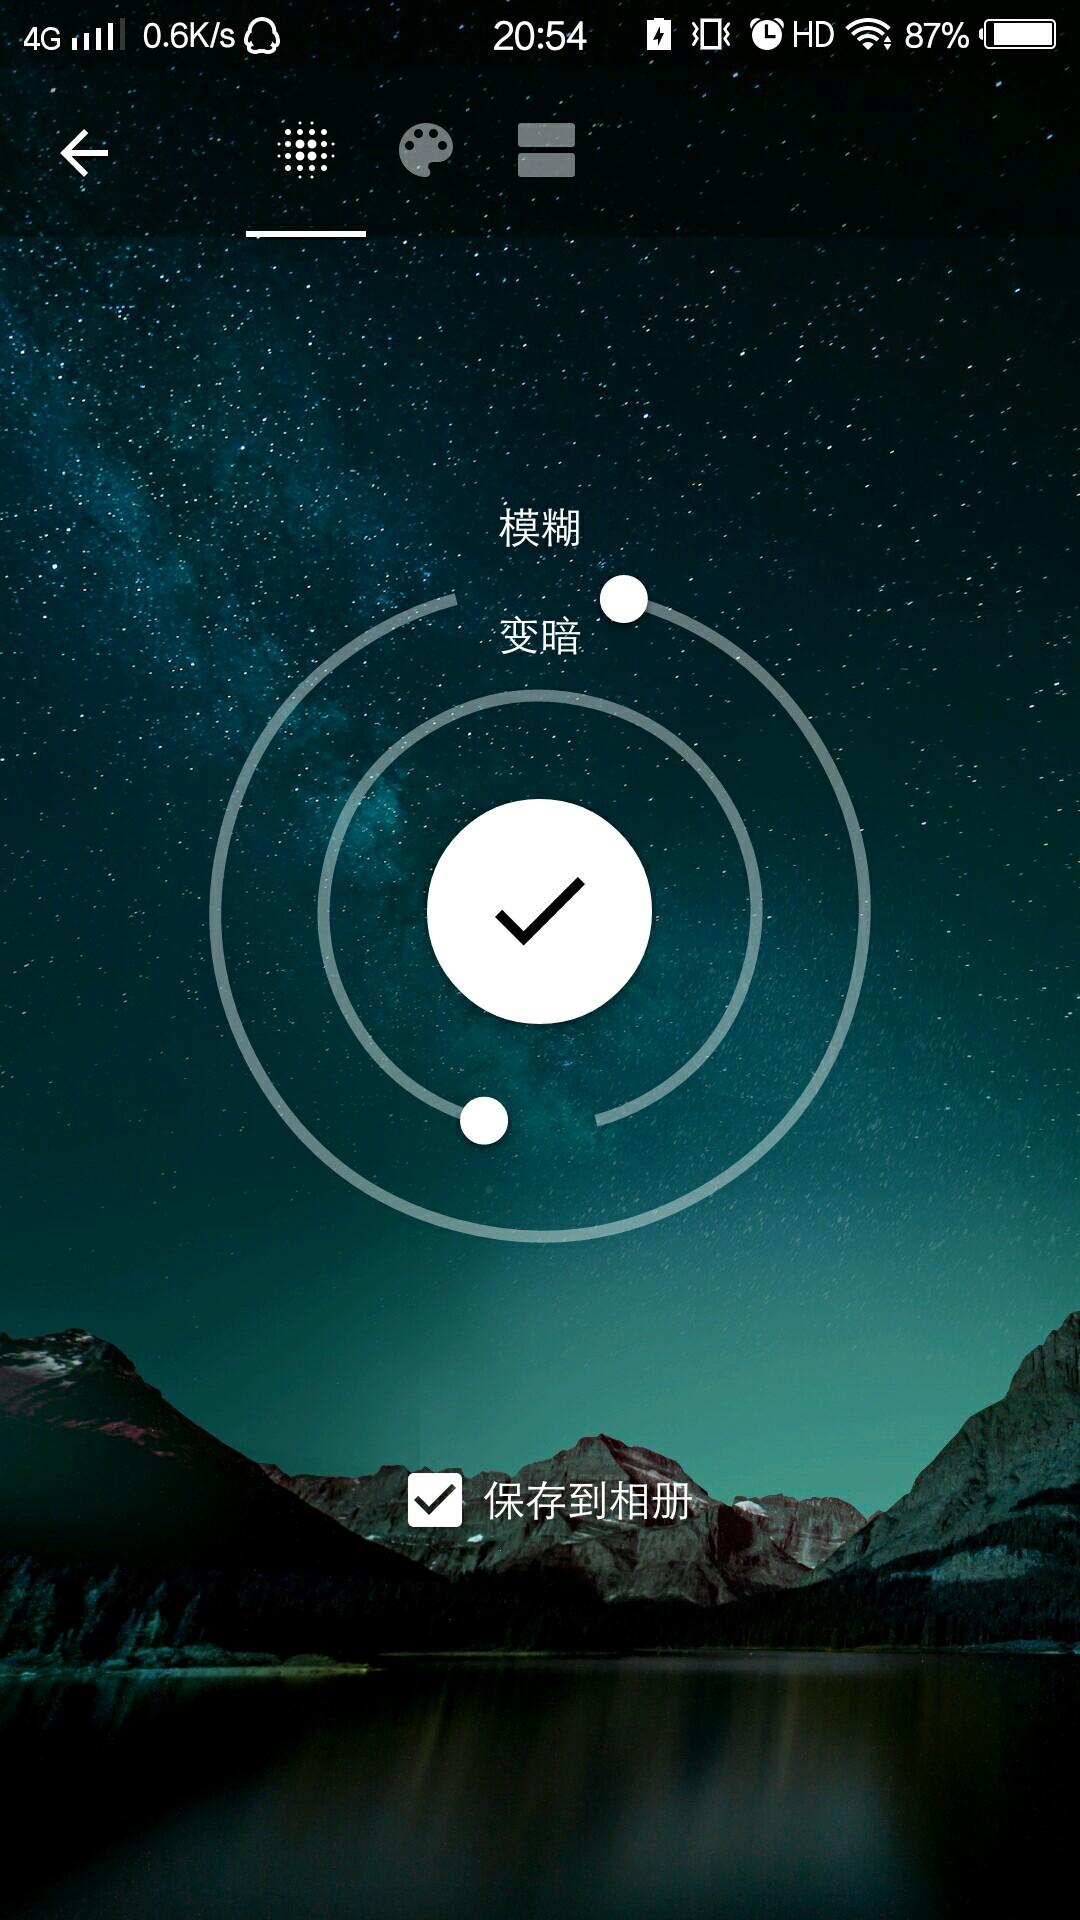 temp_??_20180213_205415.jpg